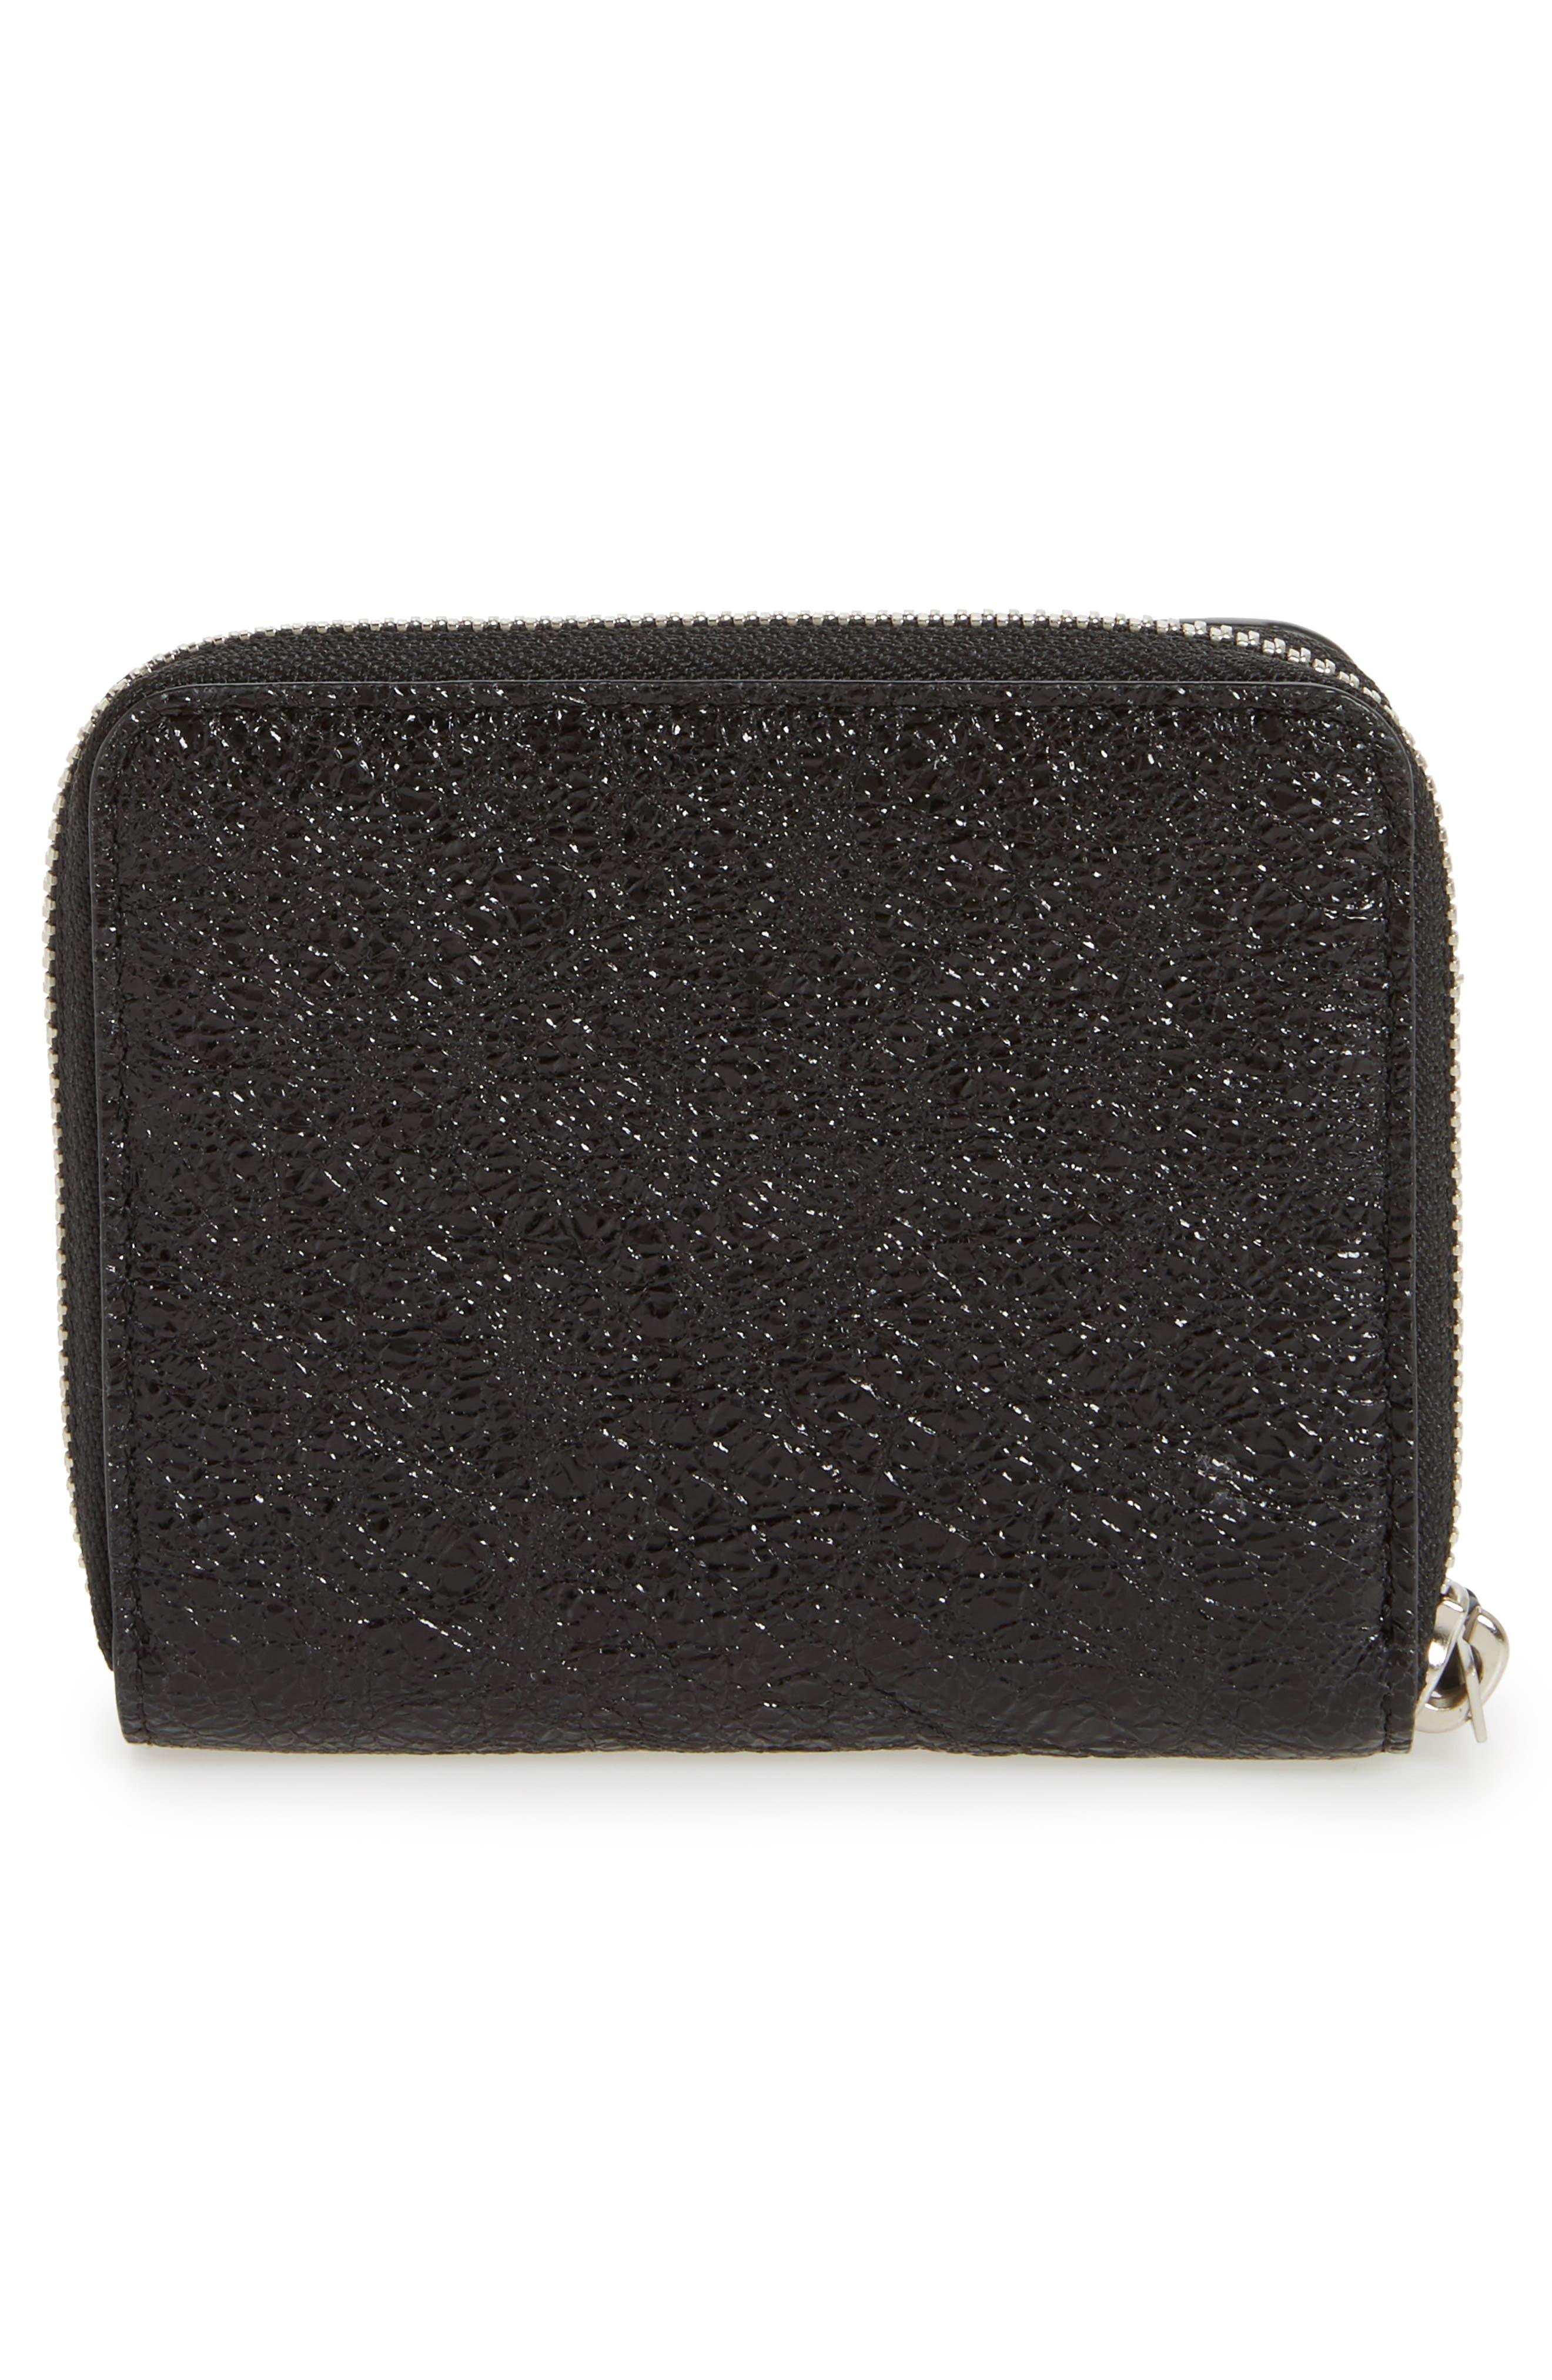 Mast Shine Leather Wallet,                             Alternate thumbnail 4, color,                             001